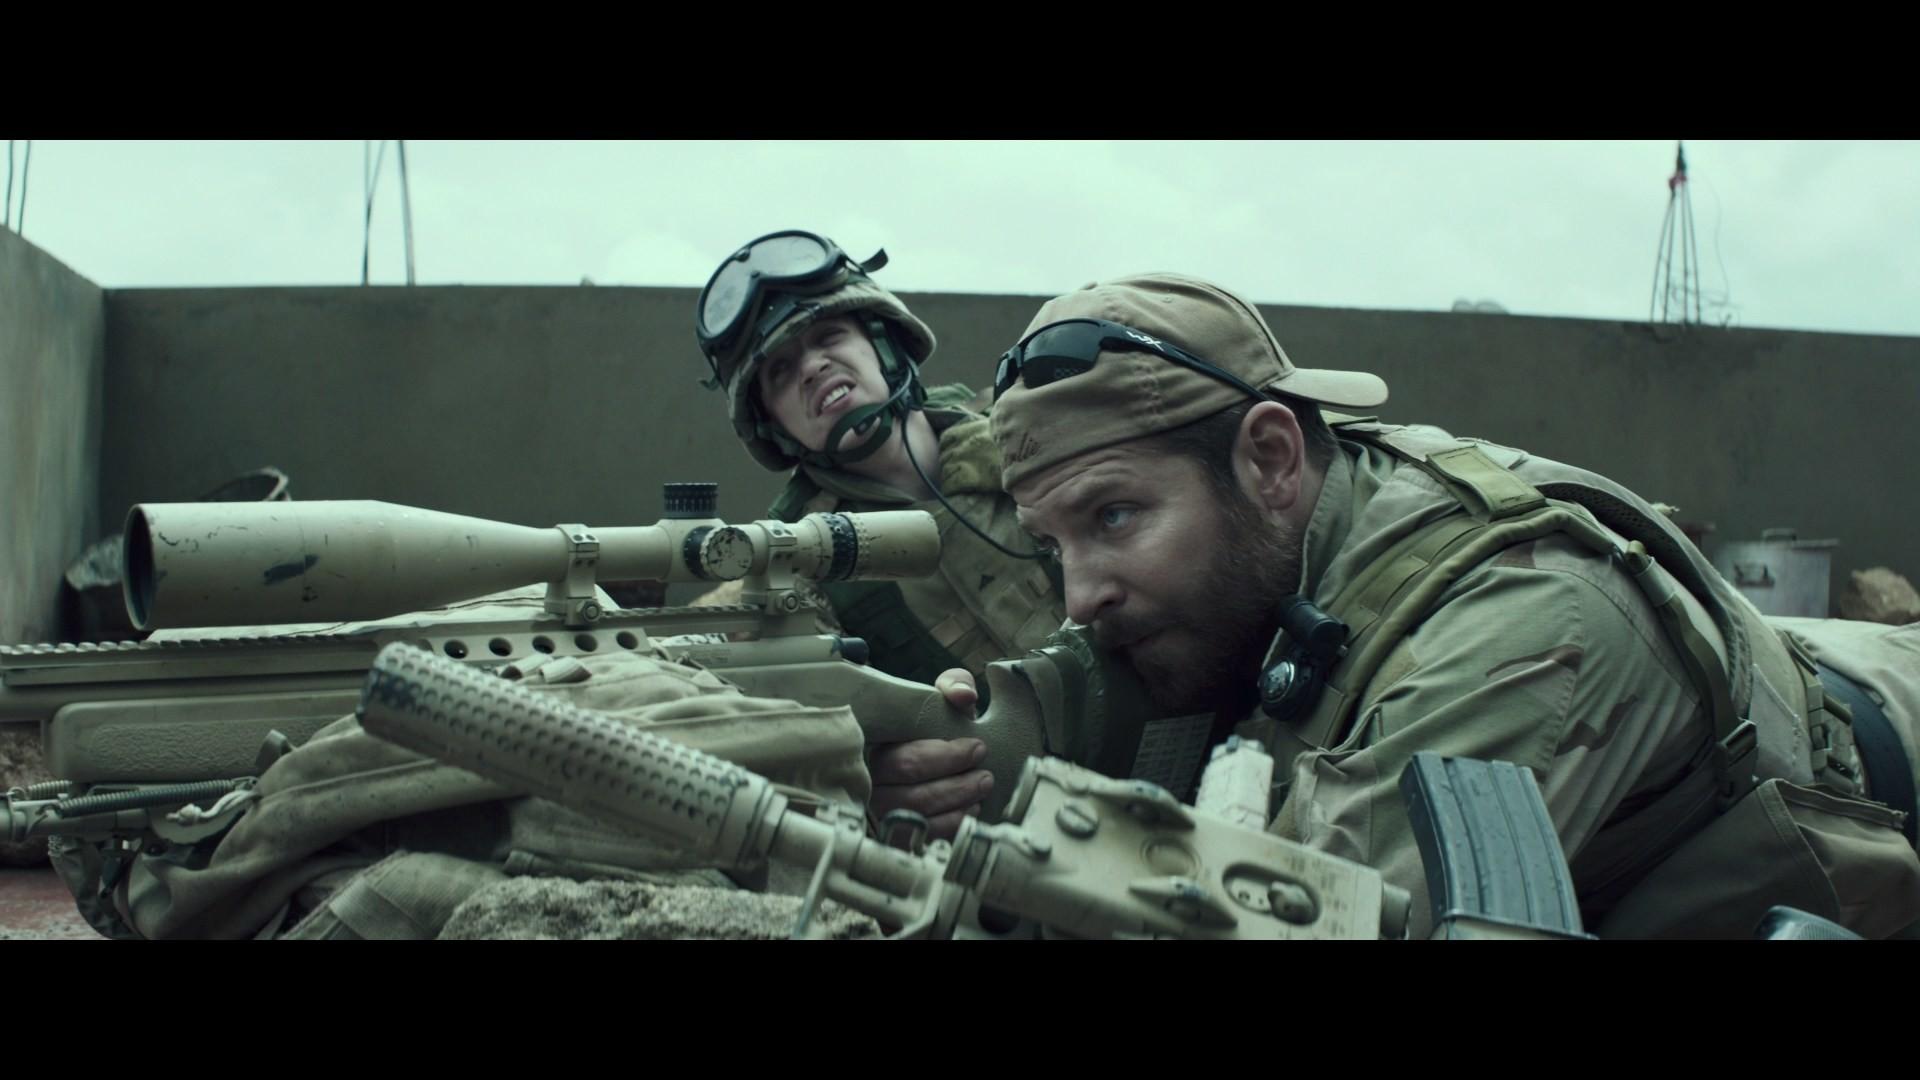 American Sniper Wallpaper Hd 68 Images